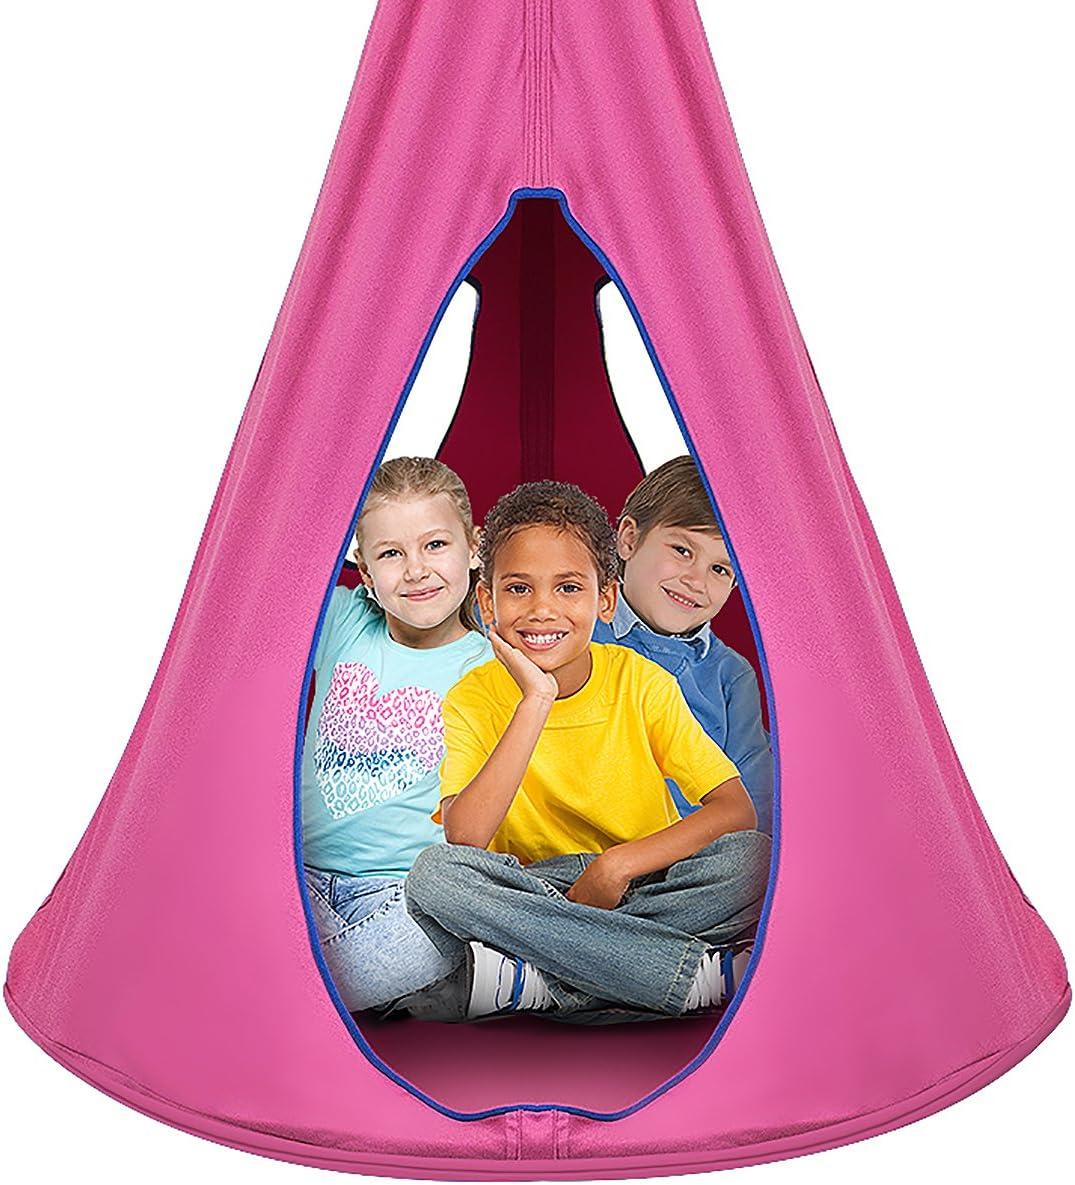 Amazon Com Sorbus Kids Nest Swing Chair Nook Hanging Seat Hammock For Indoor Outdoor Use Great For Children 40 Inch Nest Pink Furniture Decor